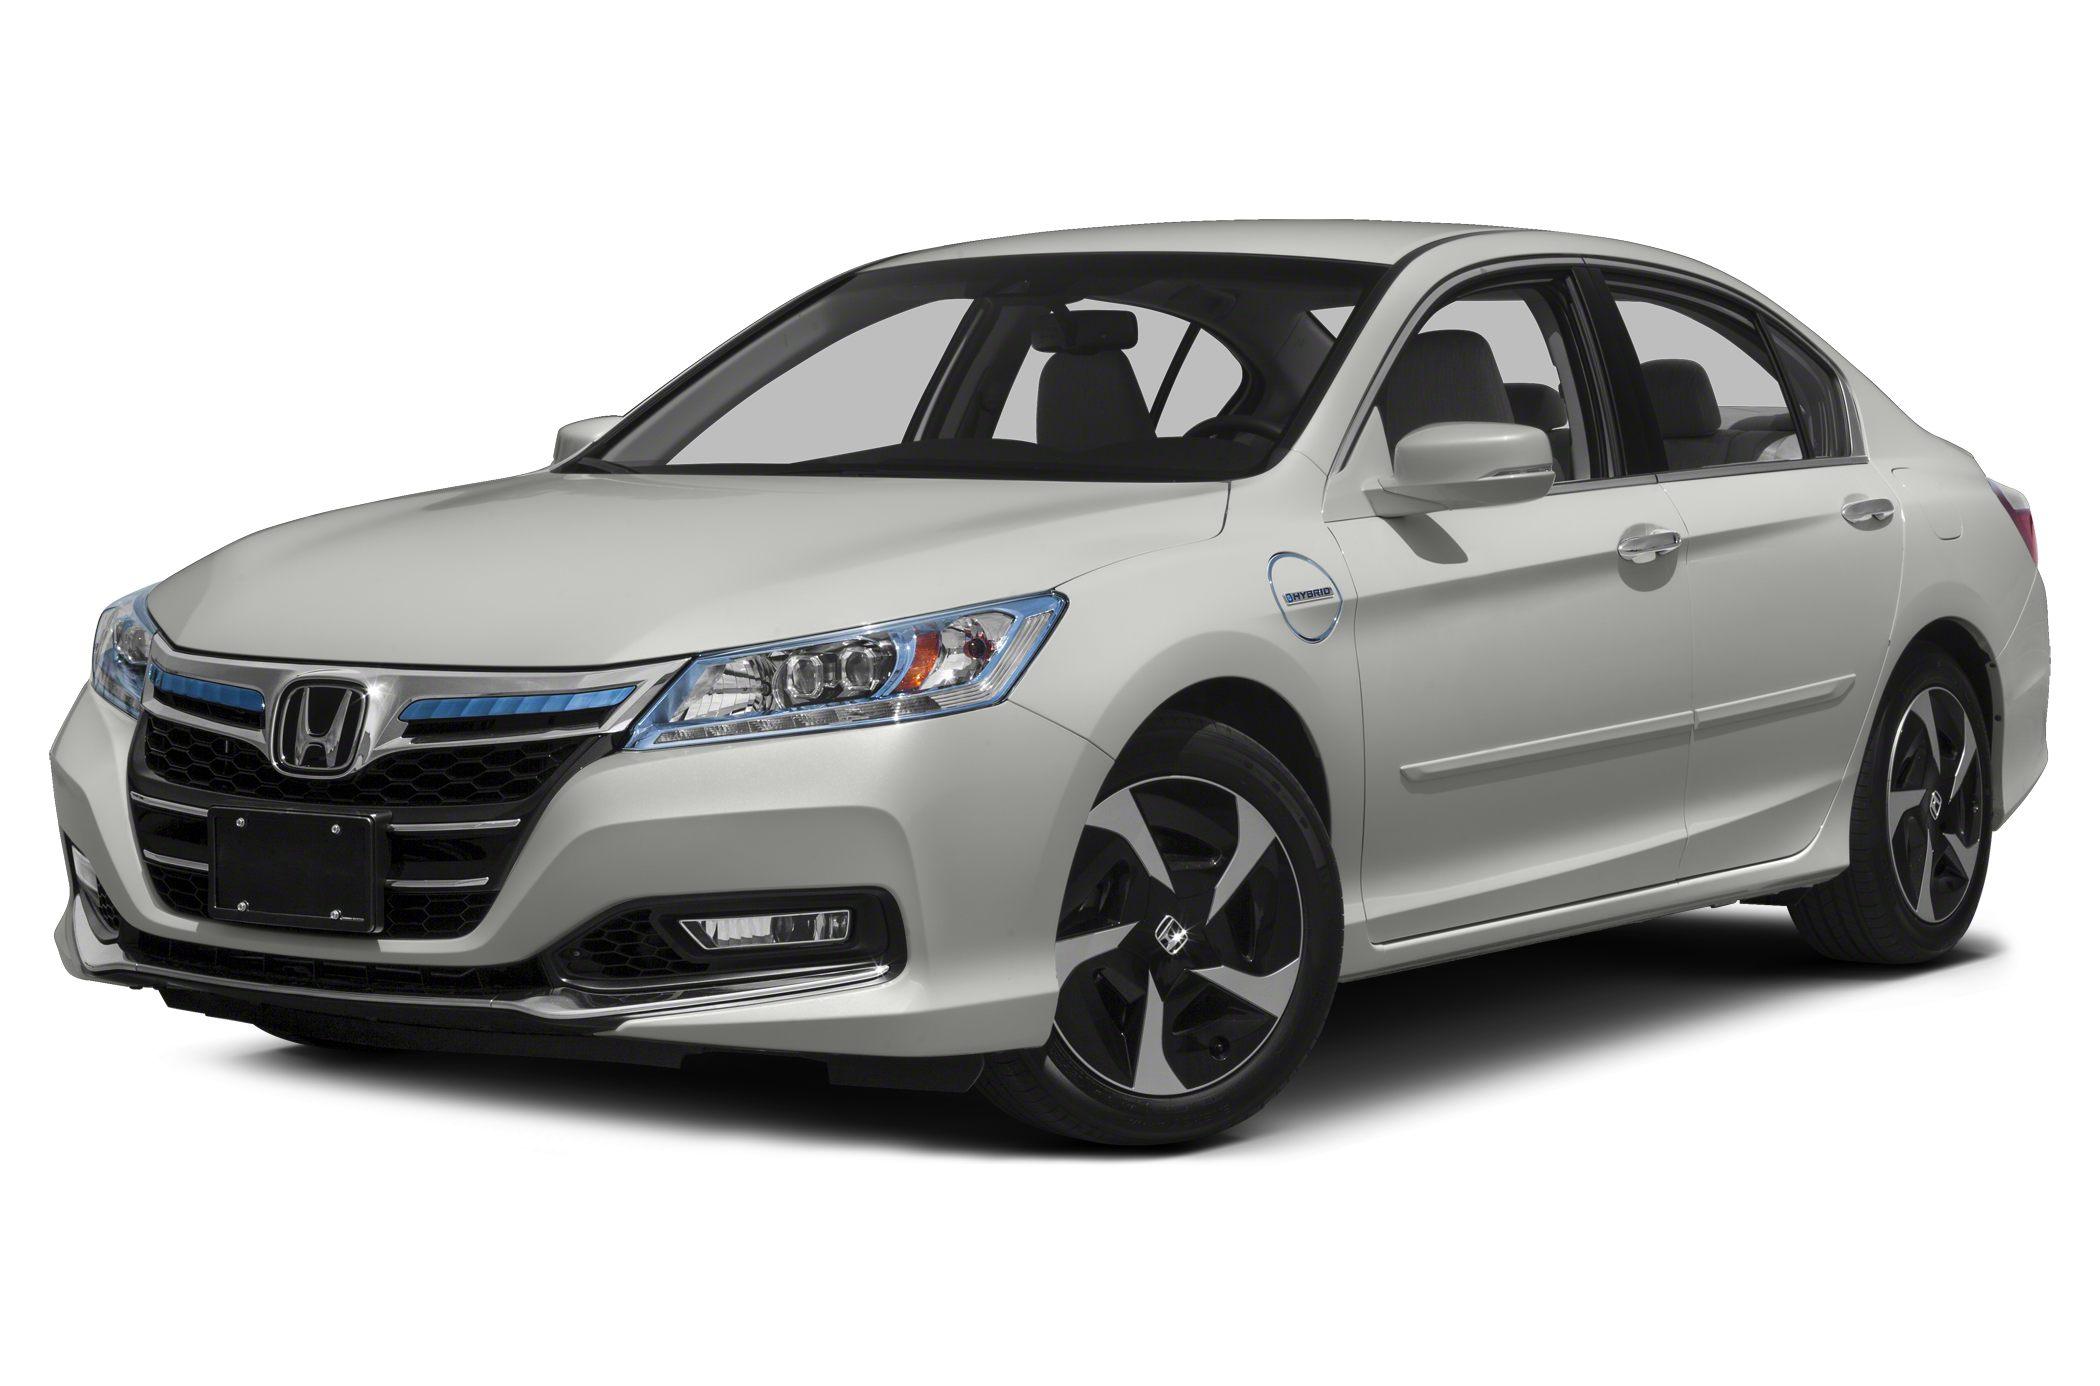 2014 Honda Accord Plug In Hybrid vs 2014 Toyota Avalon Hybrid and